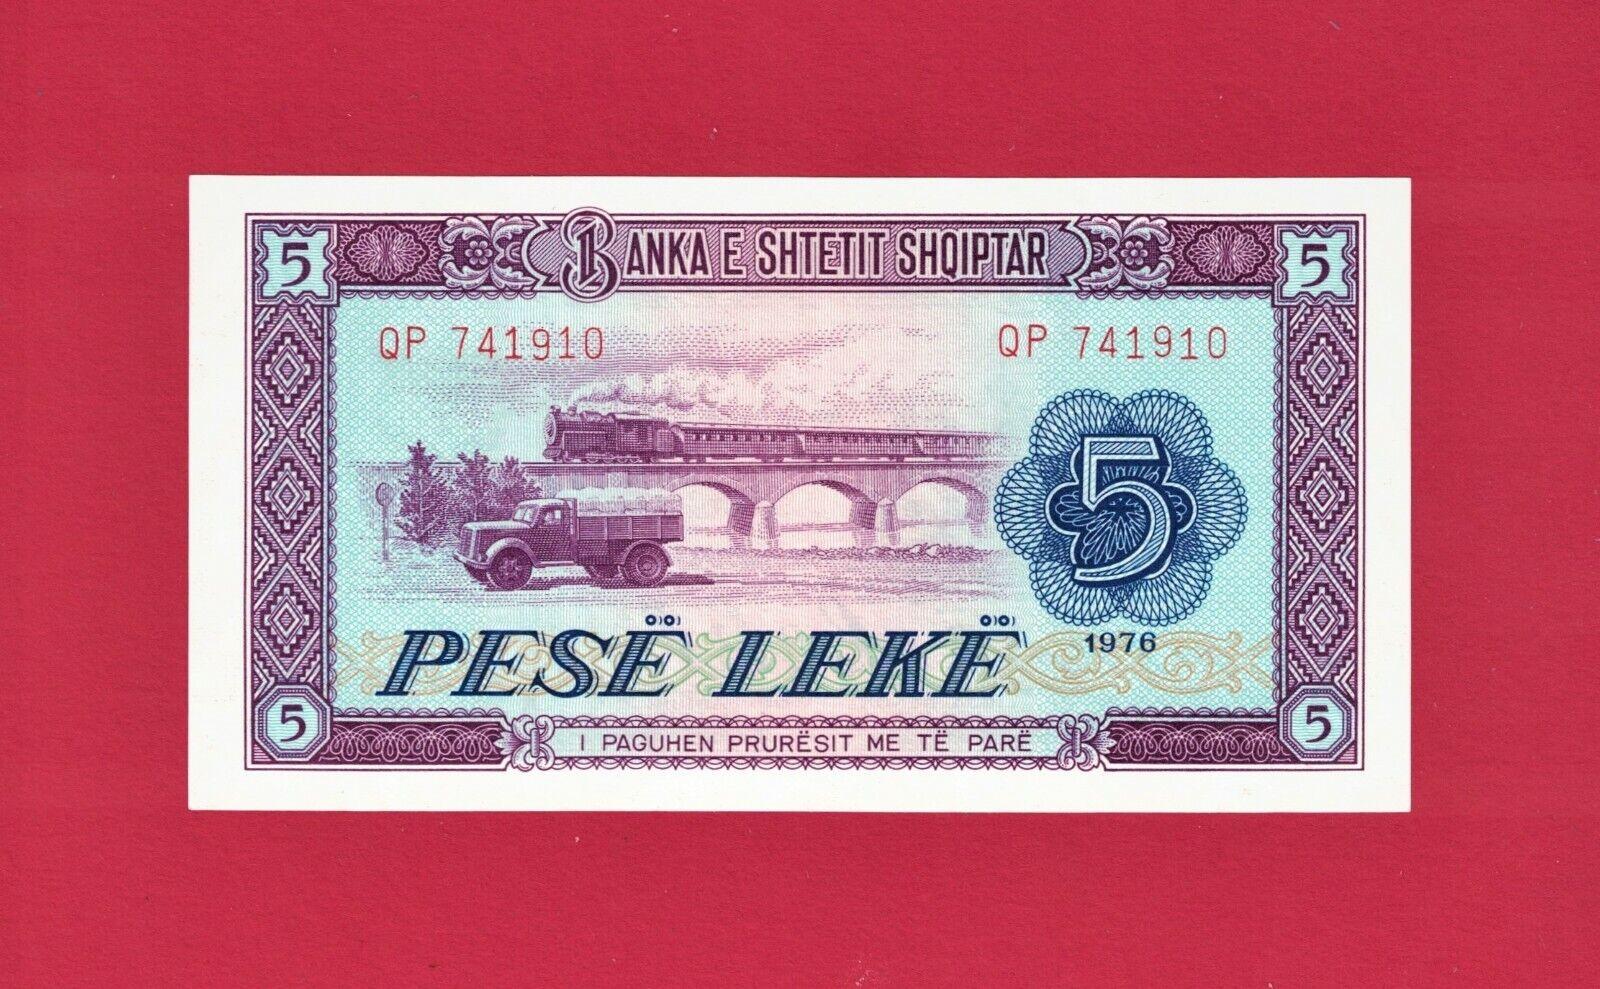 5 PESE LEKE 1976 - ALBANIA UNC NOTE - Train Truck & Ship - (P-42a) PRINTER: CBPM